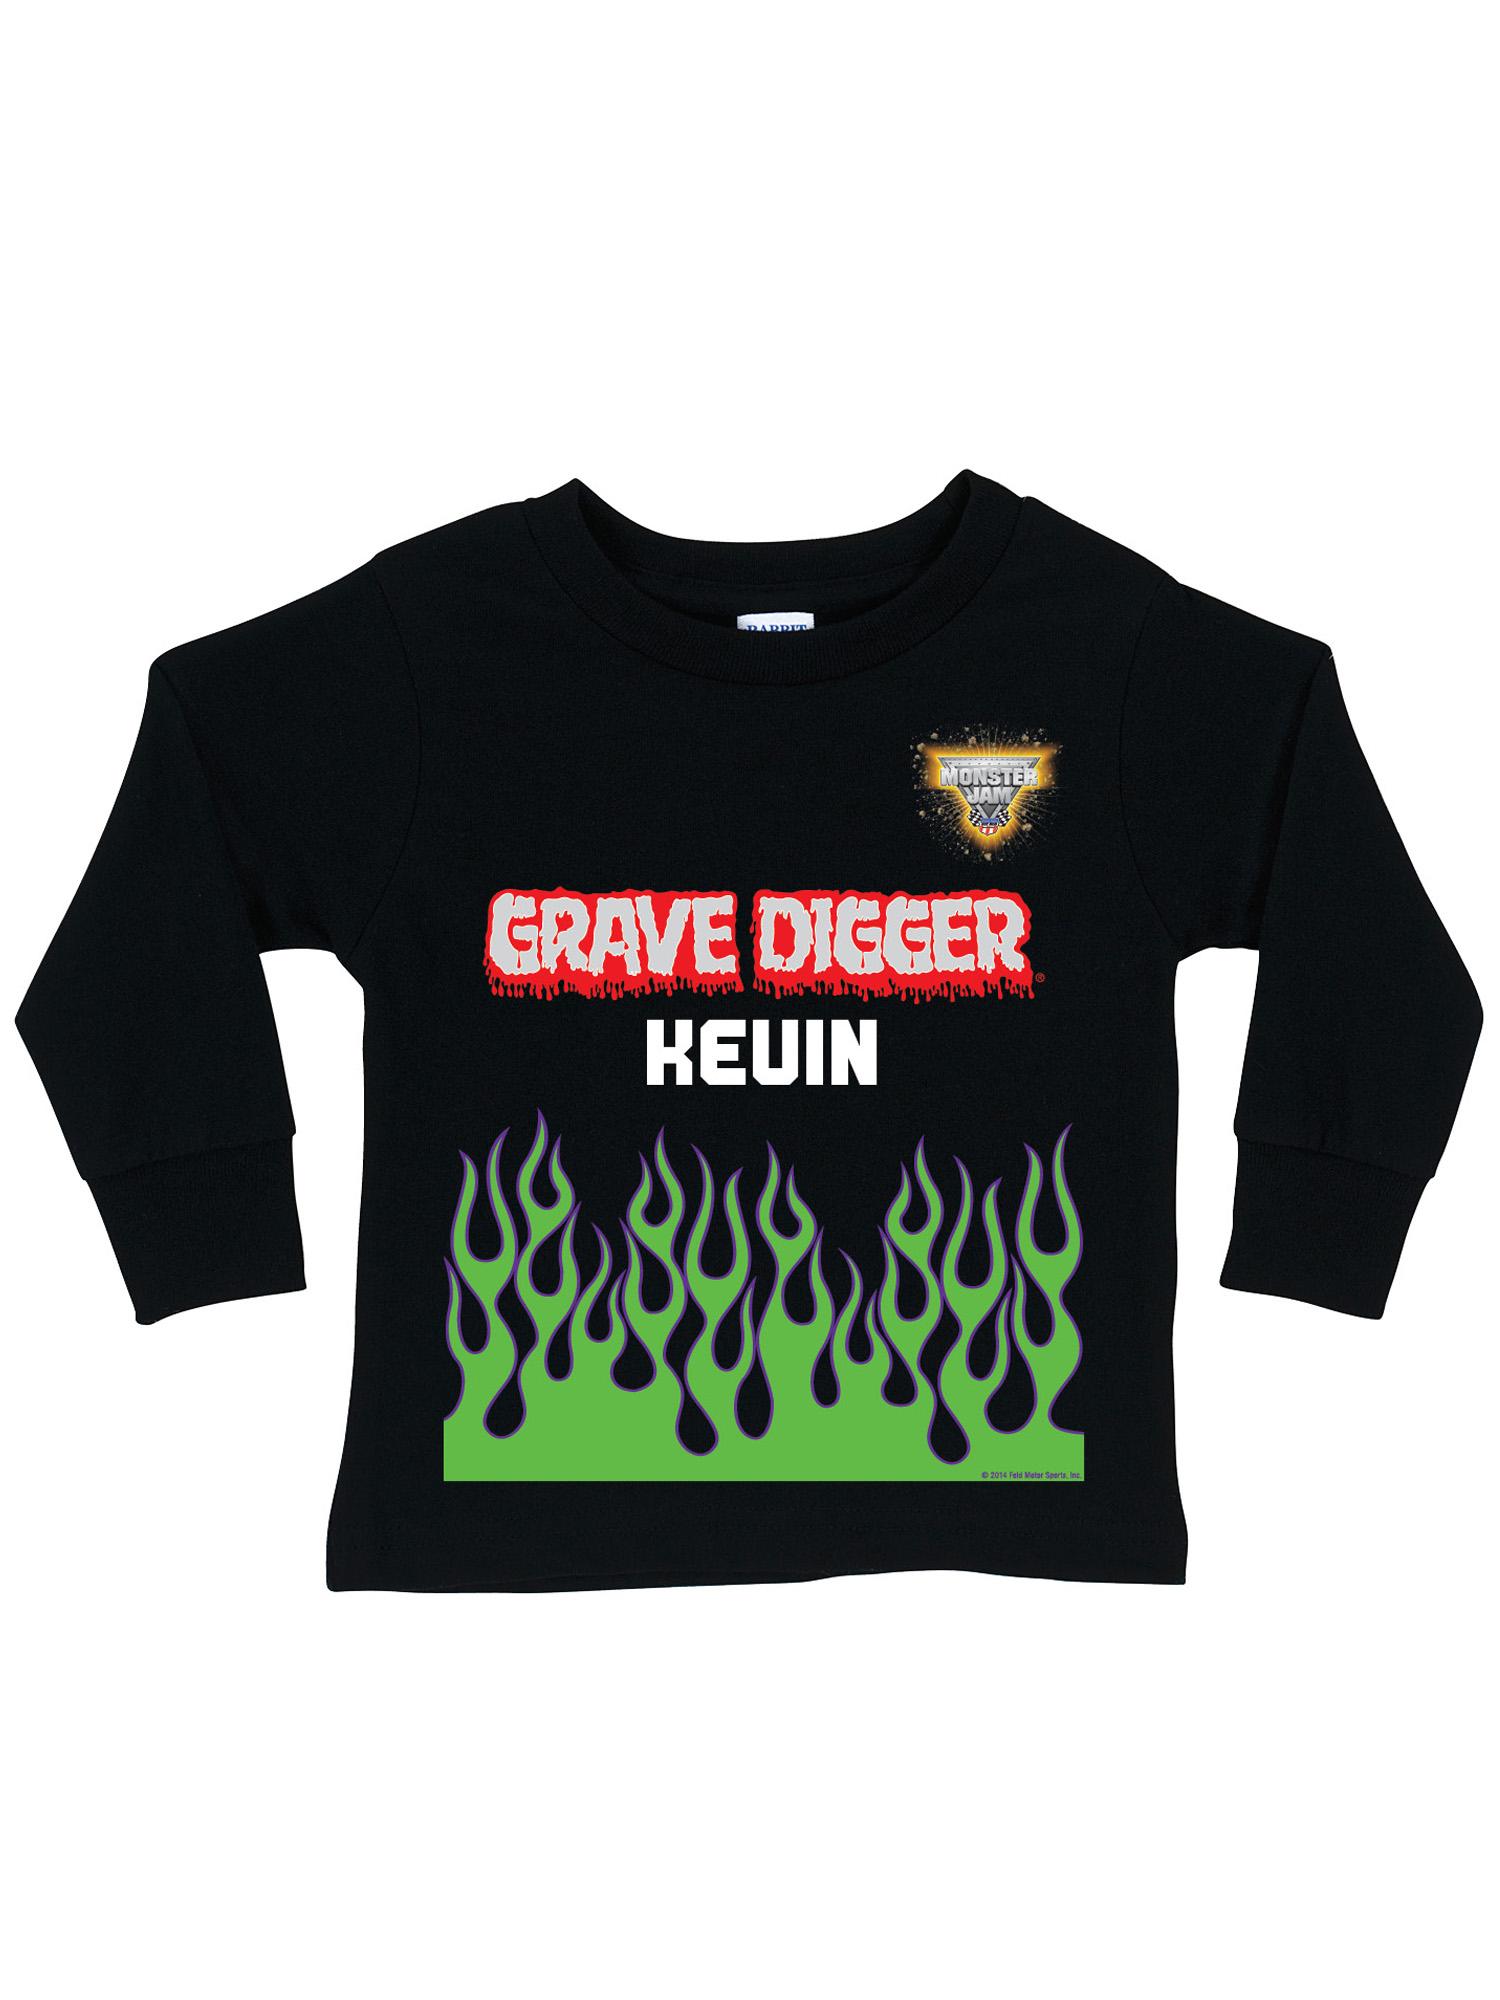 Personalized Monster Jam Grave Digger Uniform Black Long Sleeve Toddler Boys' T-Shirt